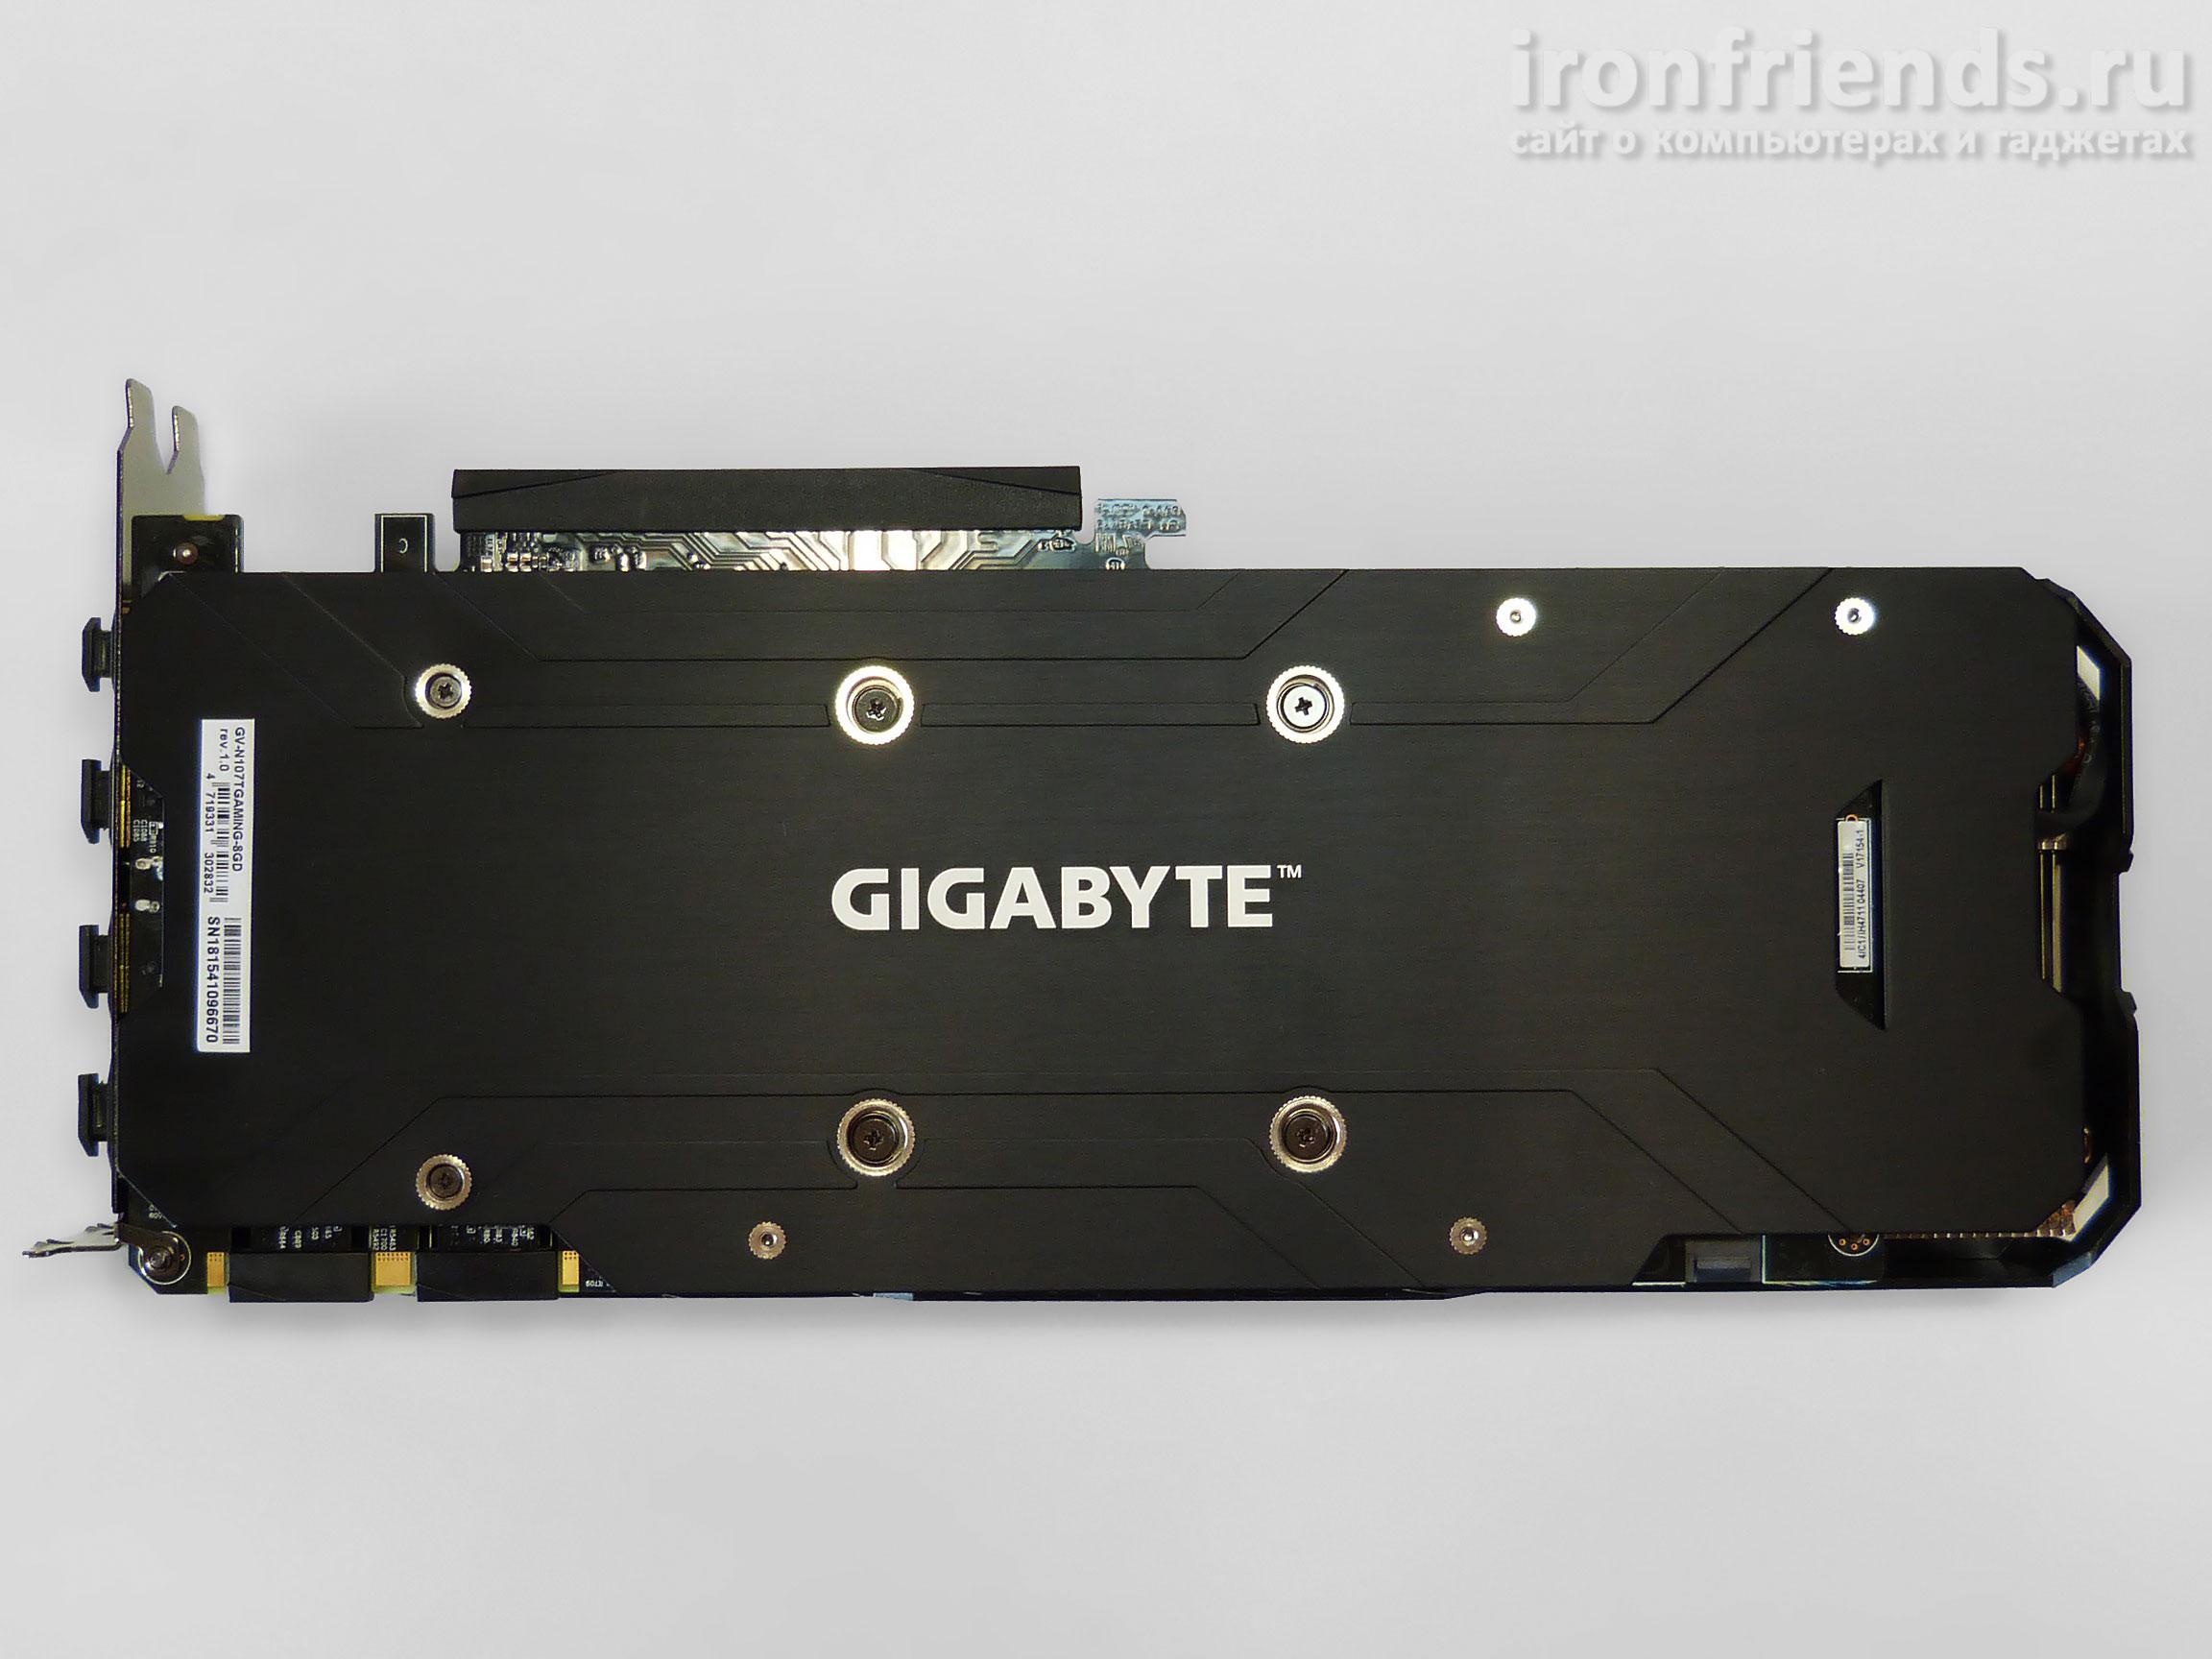 Бэкплейт Gigabyte GTX 1070 Ti Gaming 8G